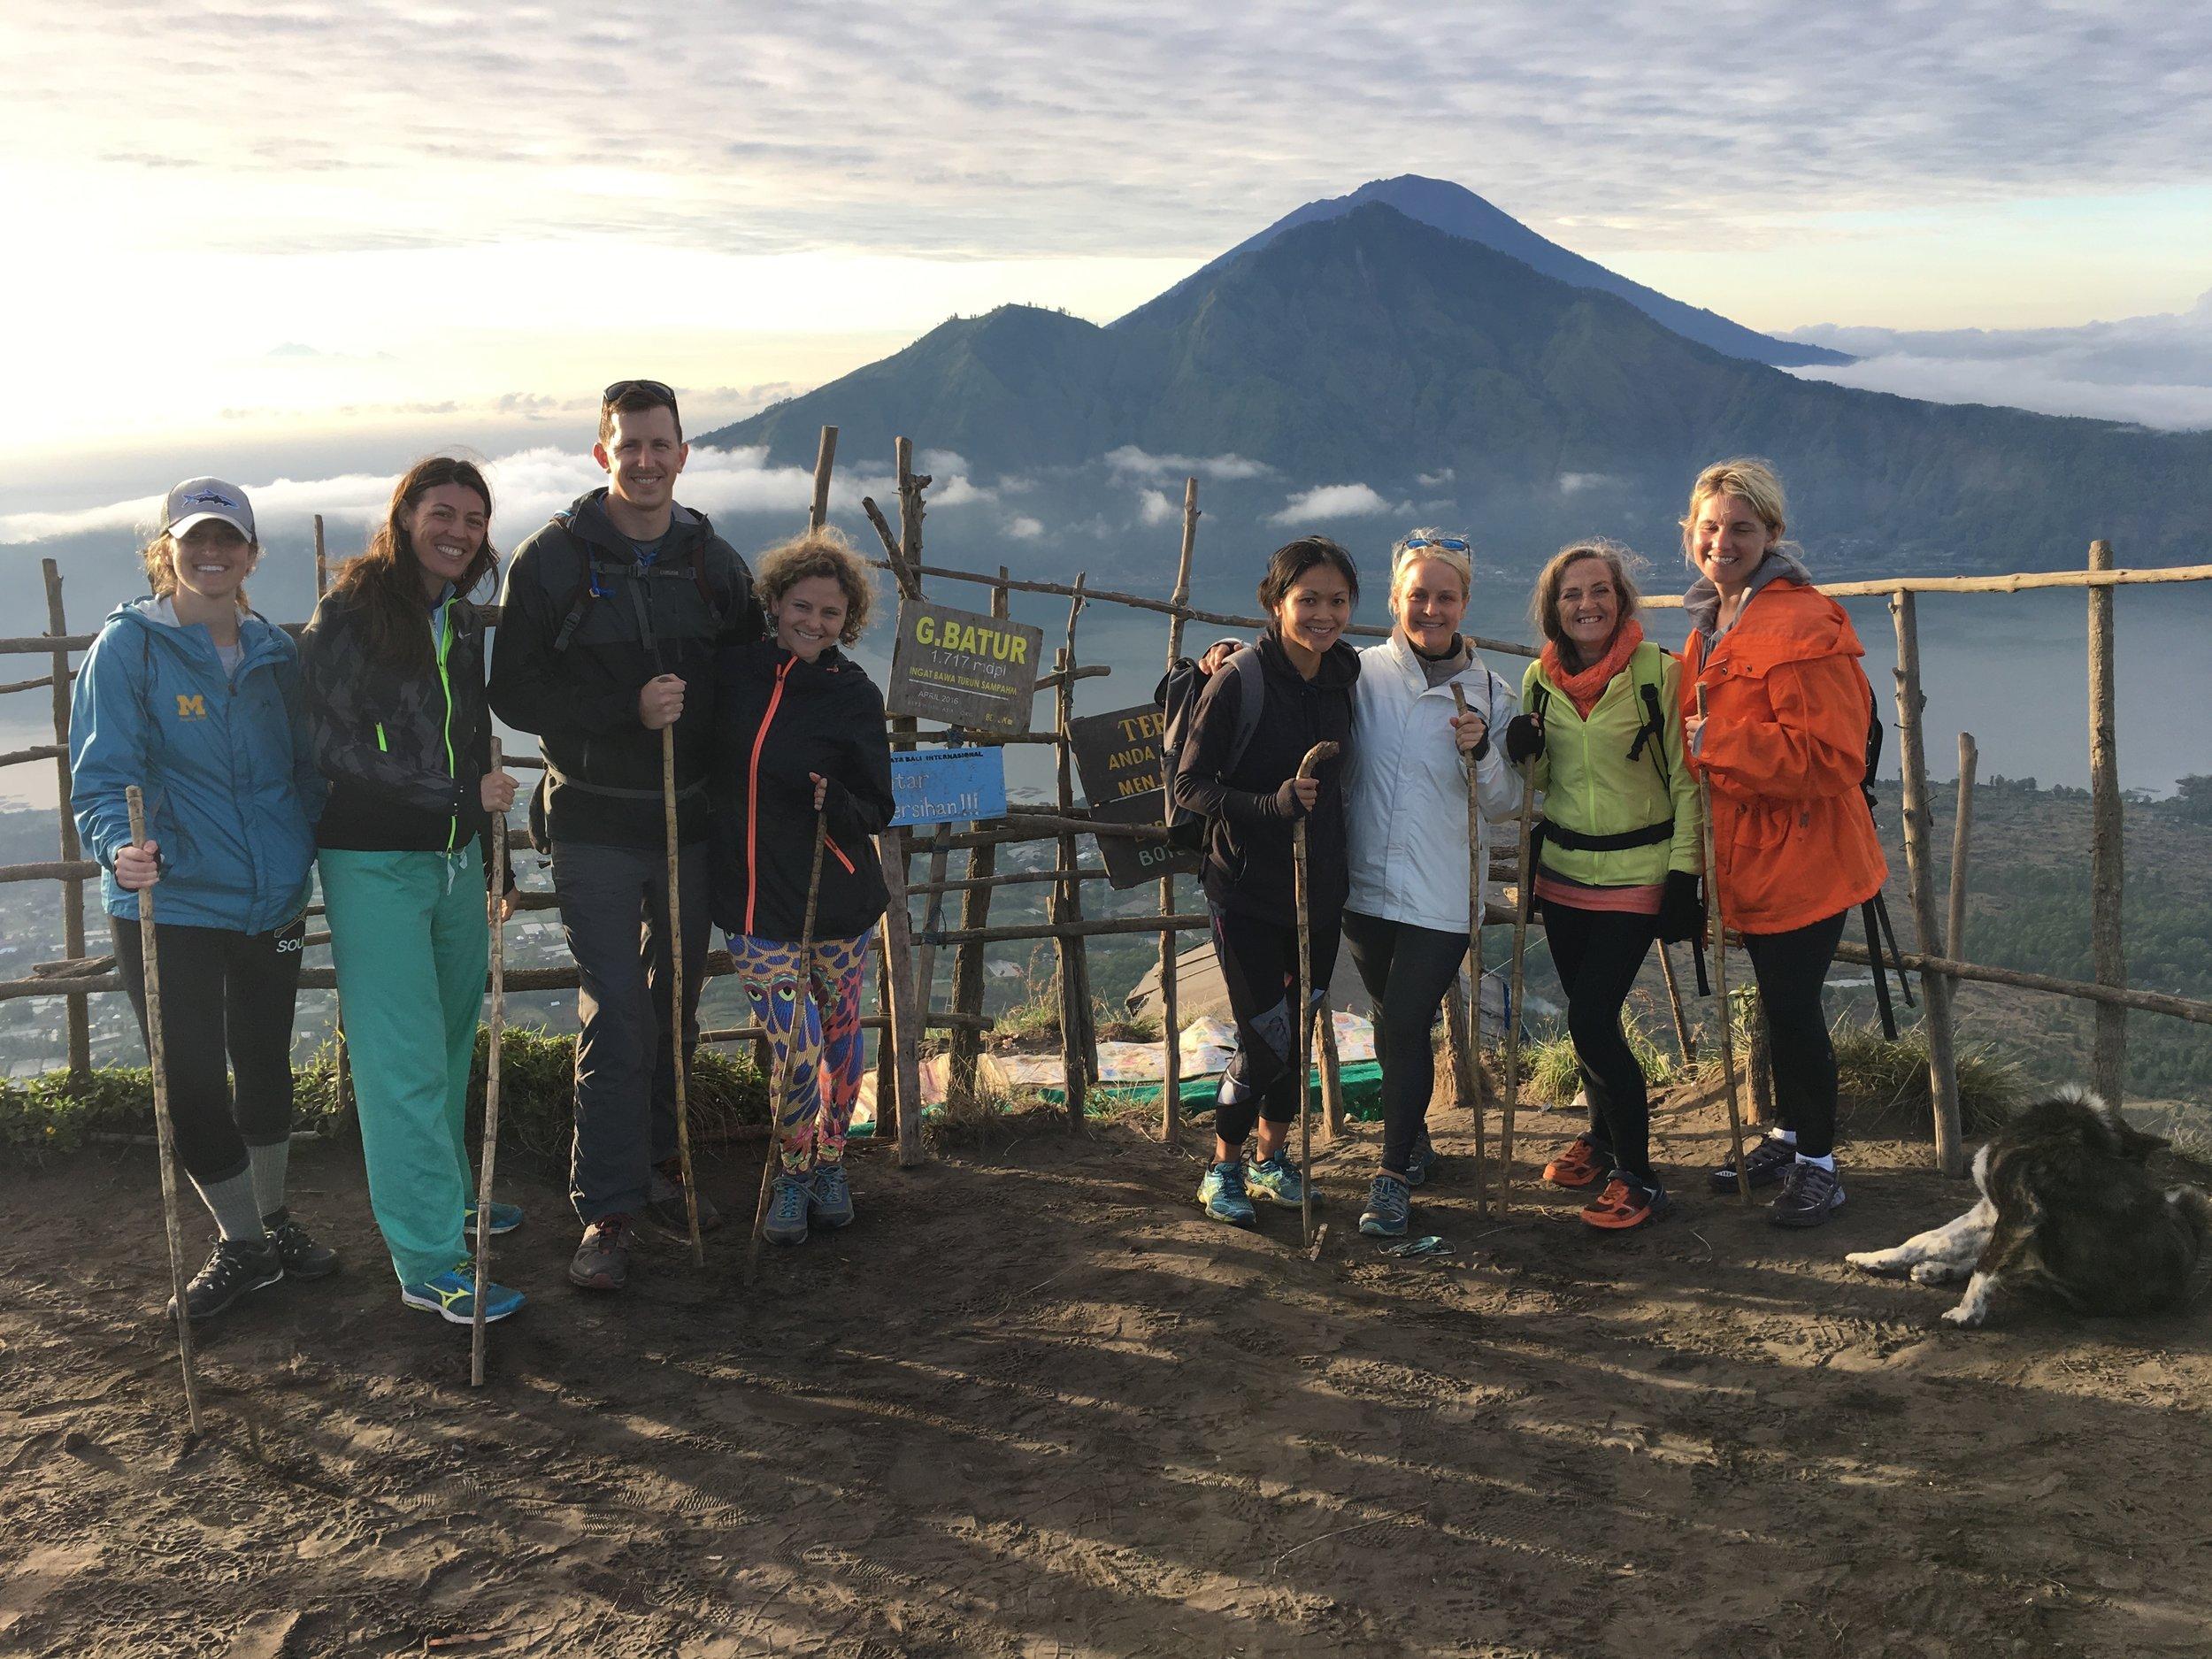 Sunrise Volcano Climb: Mt. Batur - Bali, Indonesia